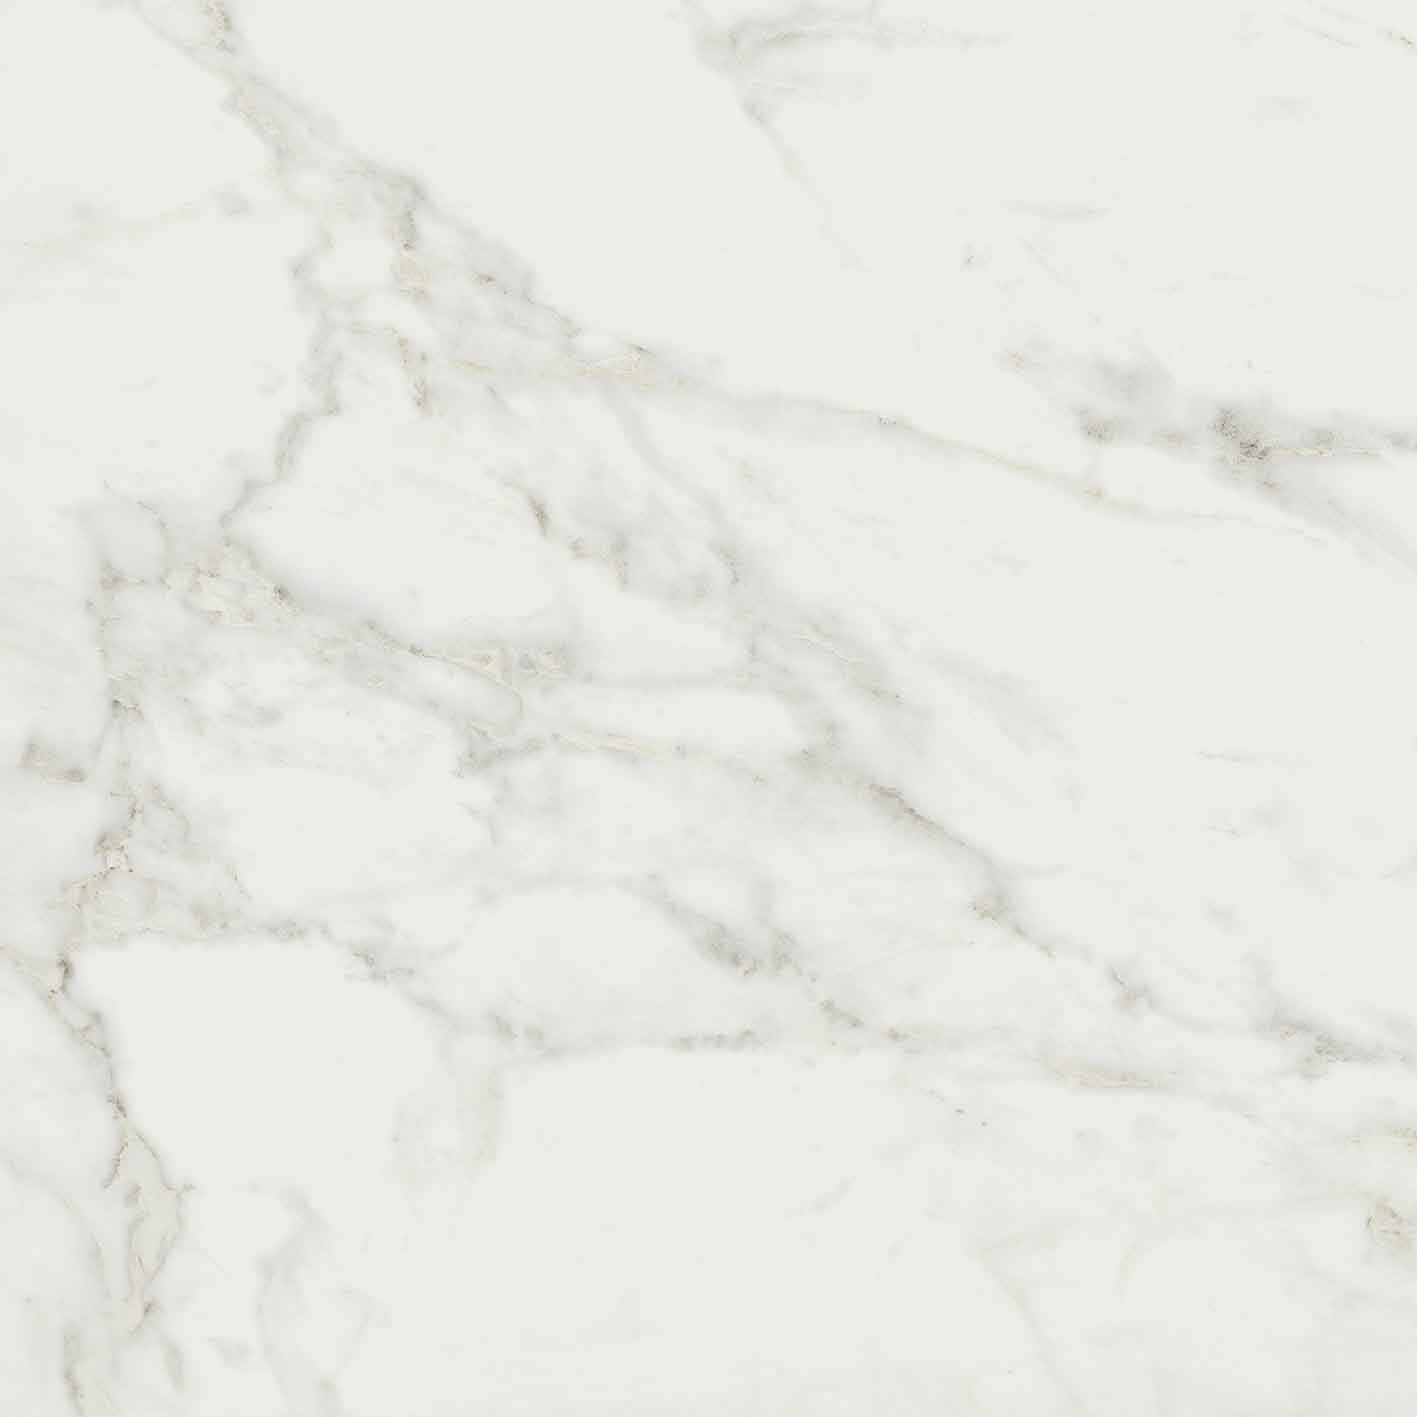 Exalt of Cerim Magic White Glossy 10mm 80 x 80